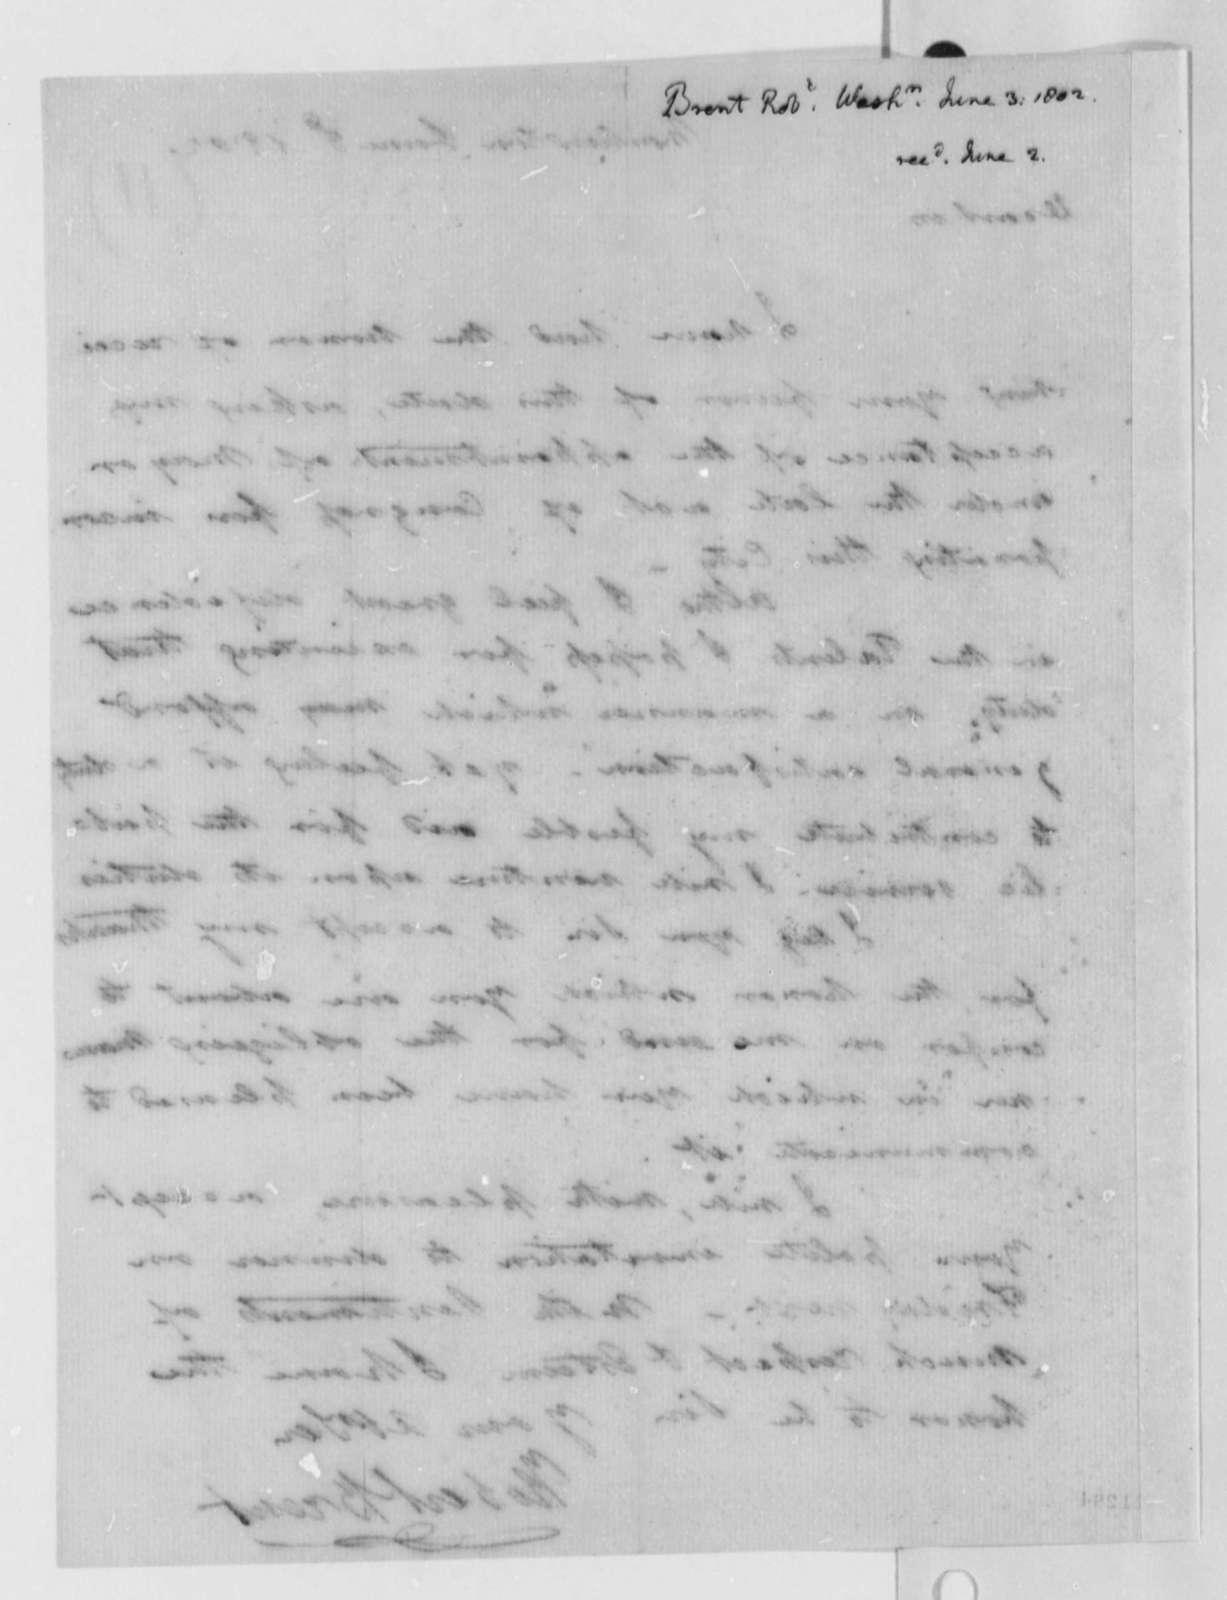 Robert Brent to Thomas Jefferson, June 3, 1802